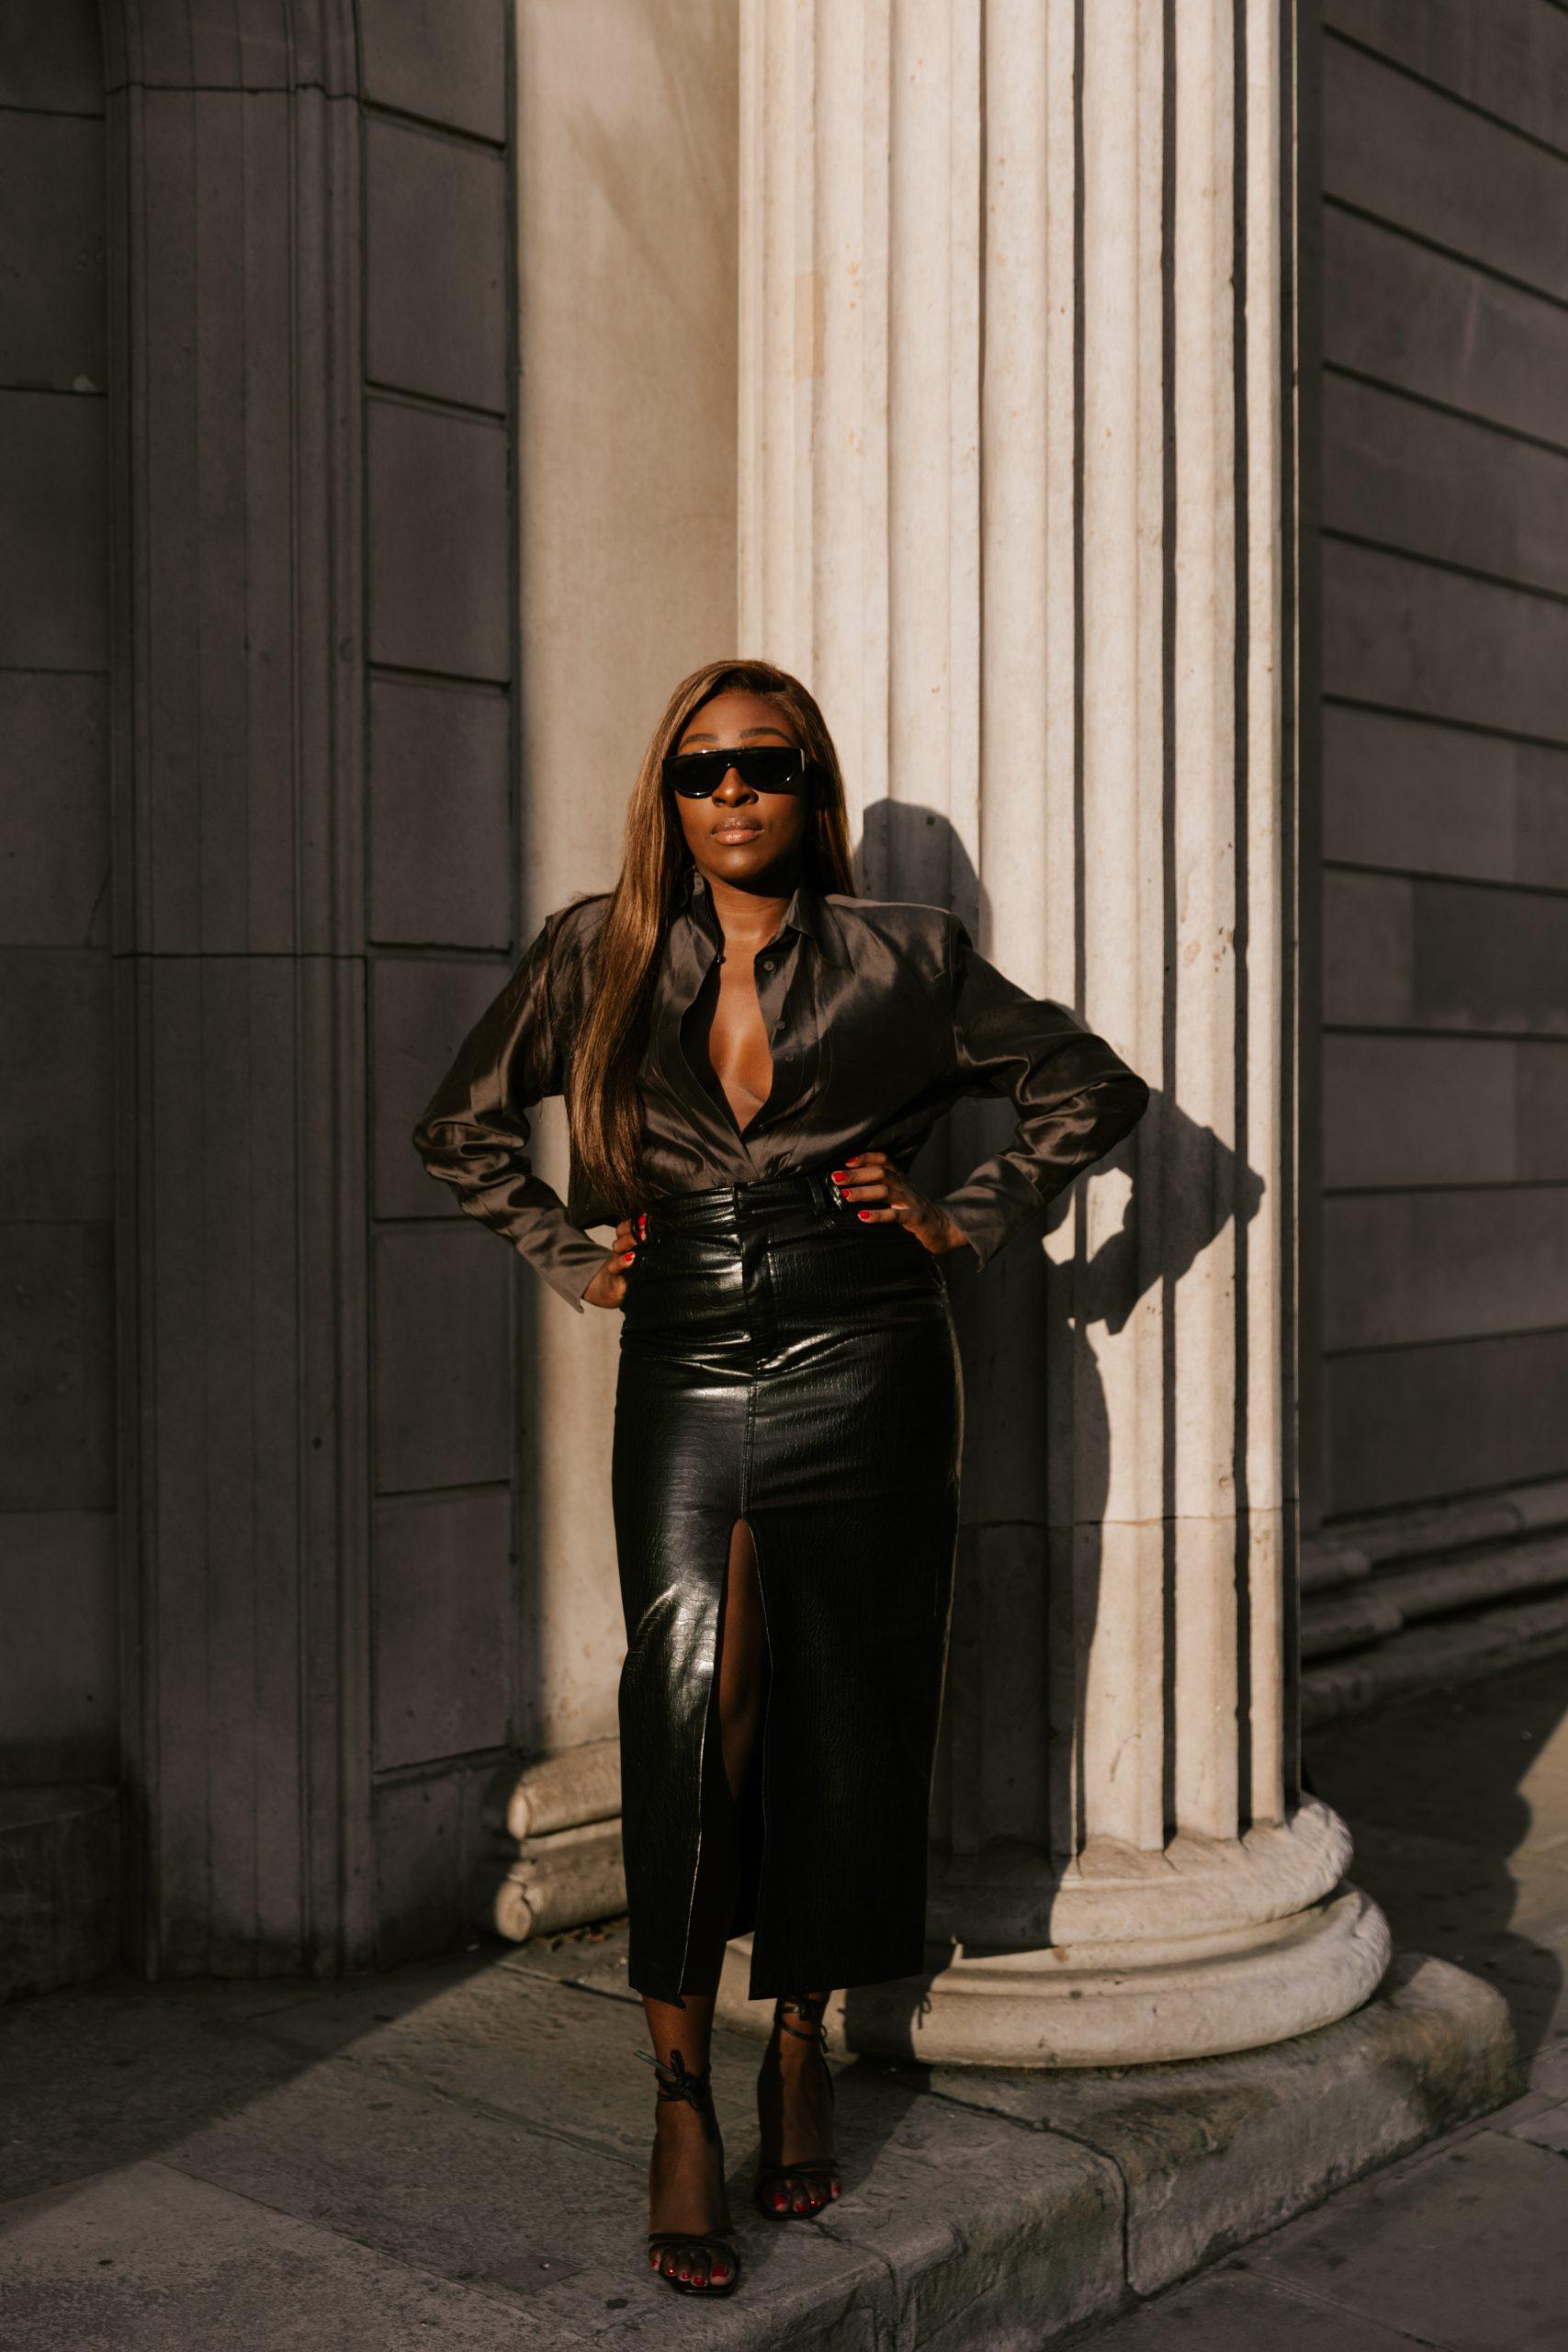 Faux leather skirt zara - chocolate brown silk blouse massimo dutti 3 - Bottega Veneta Sunglasses